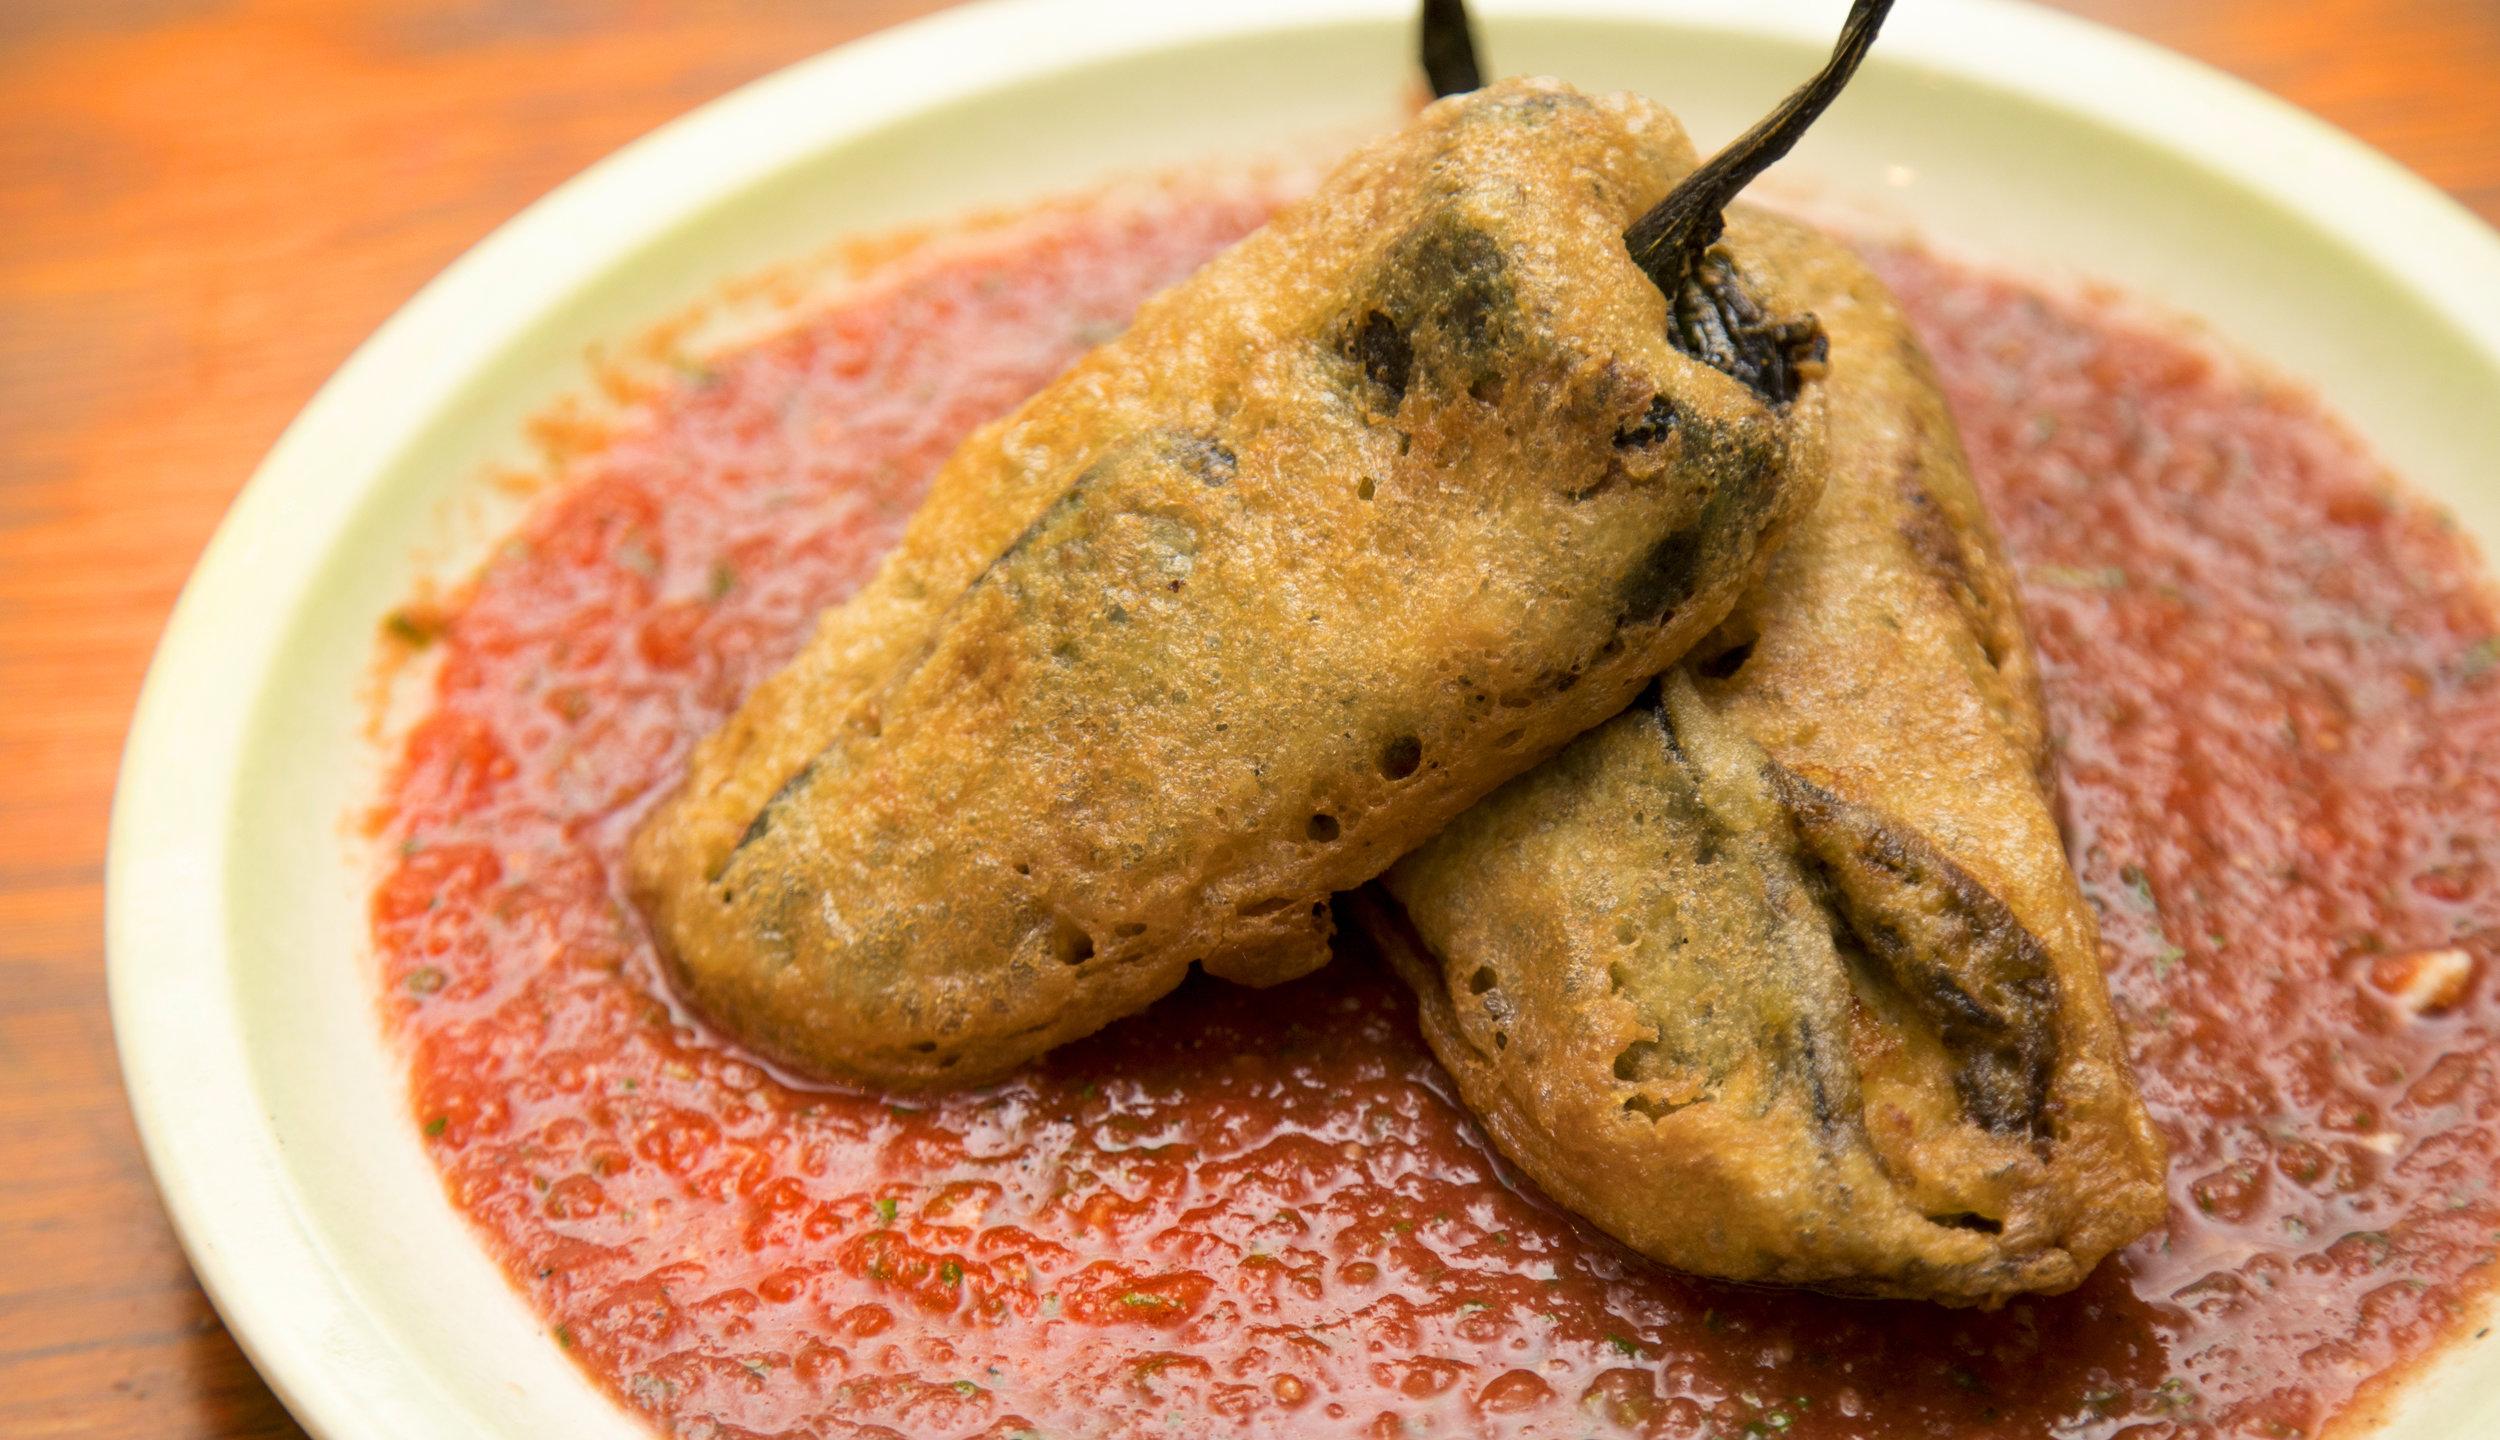 Boudin Stuffed Chili Rellenos Vegan Butcher Porch Wine Gravy Louisiana Food Recipes By Jolie Meaux